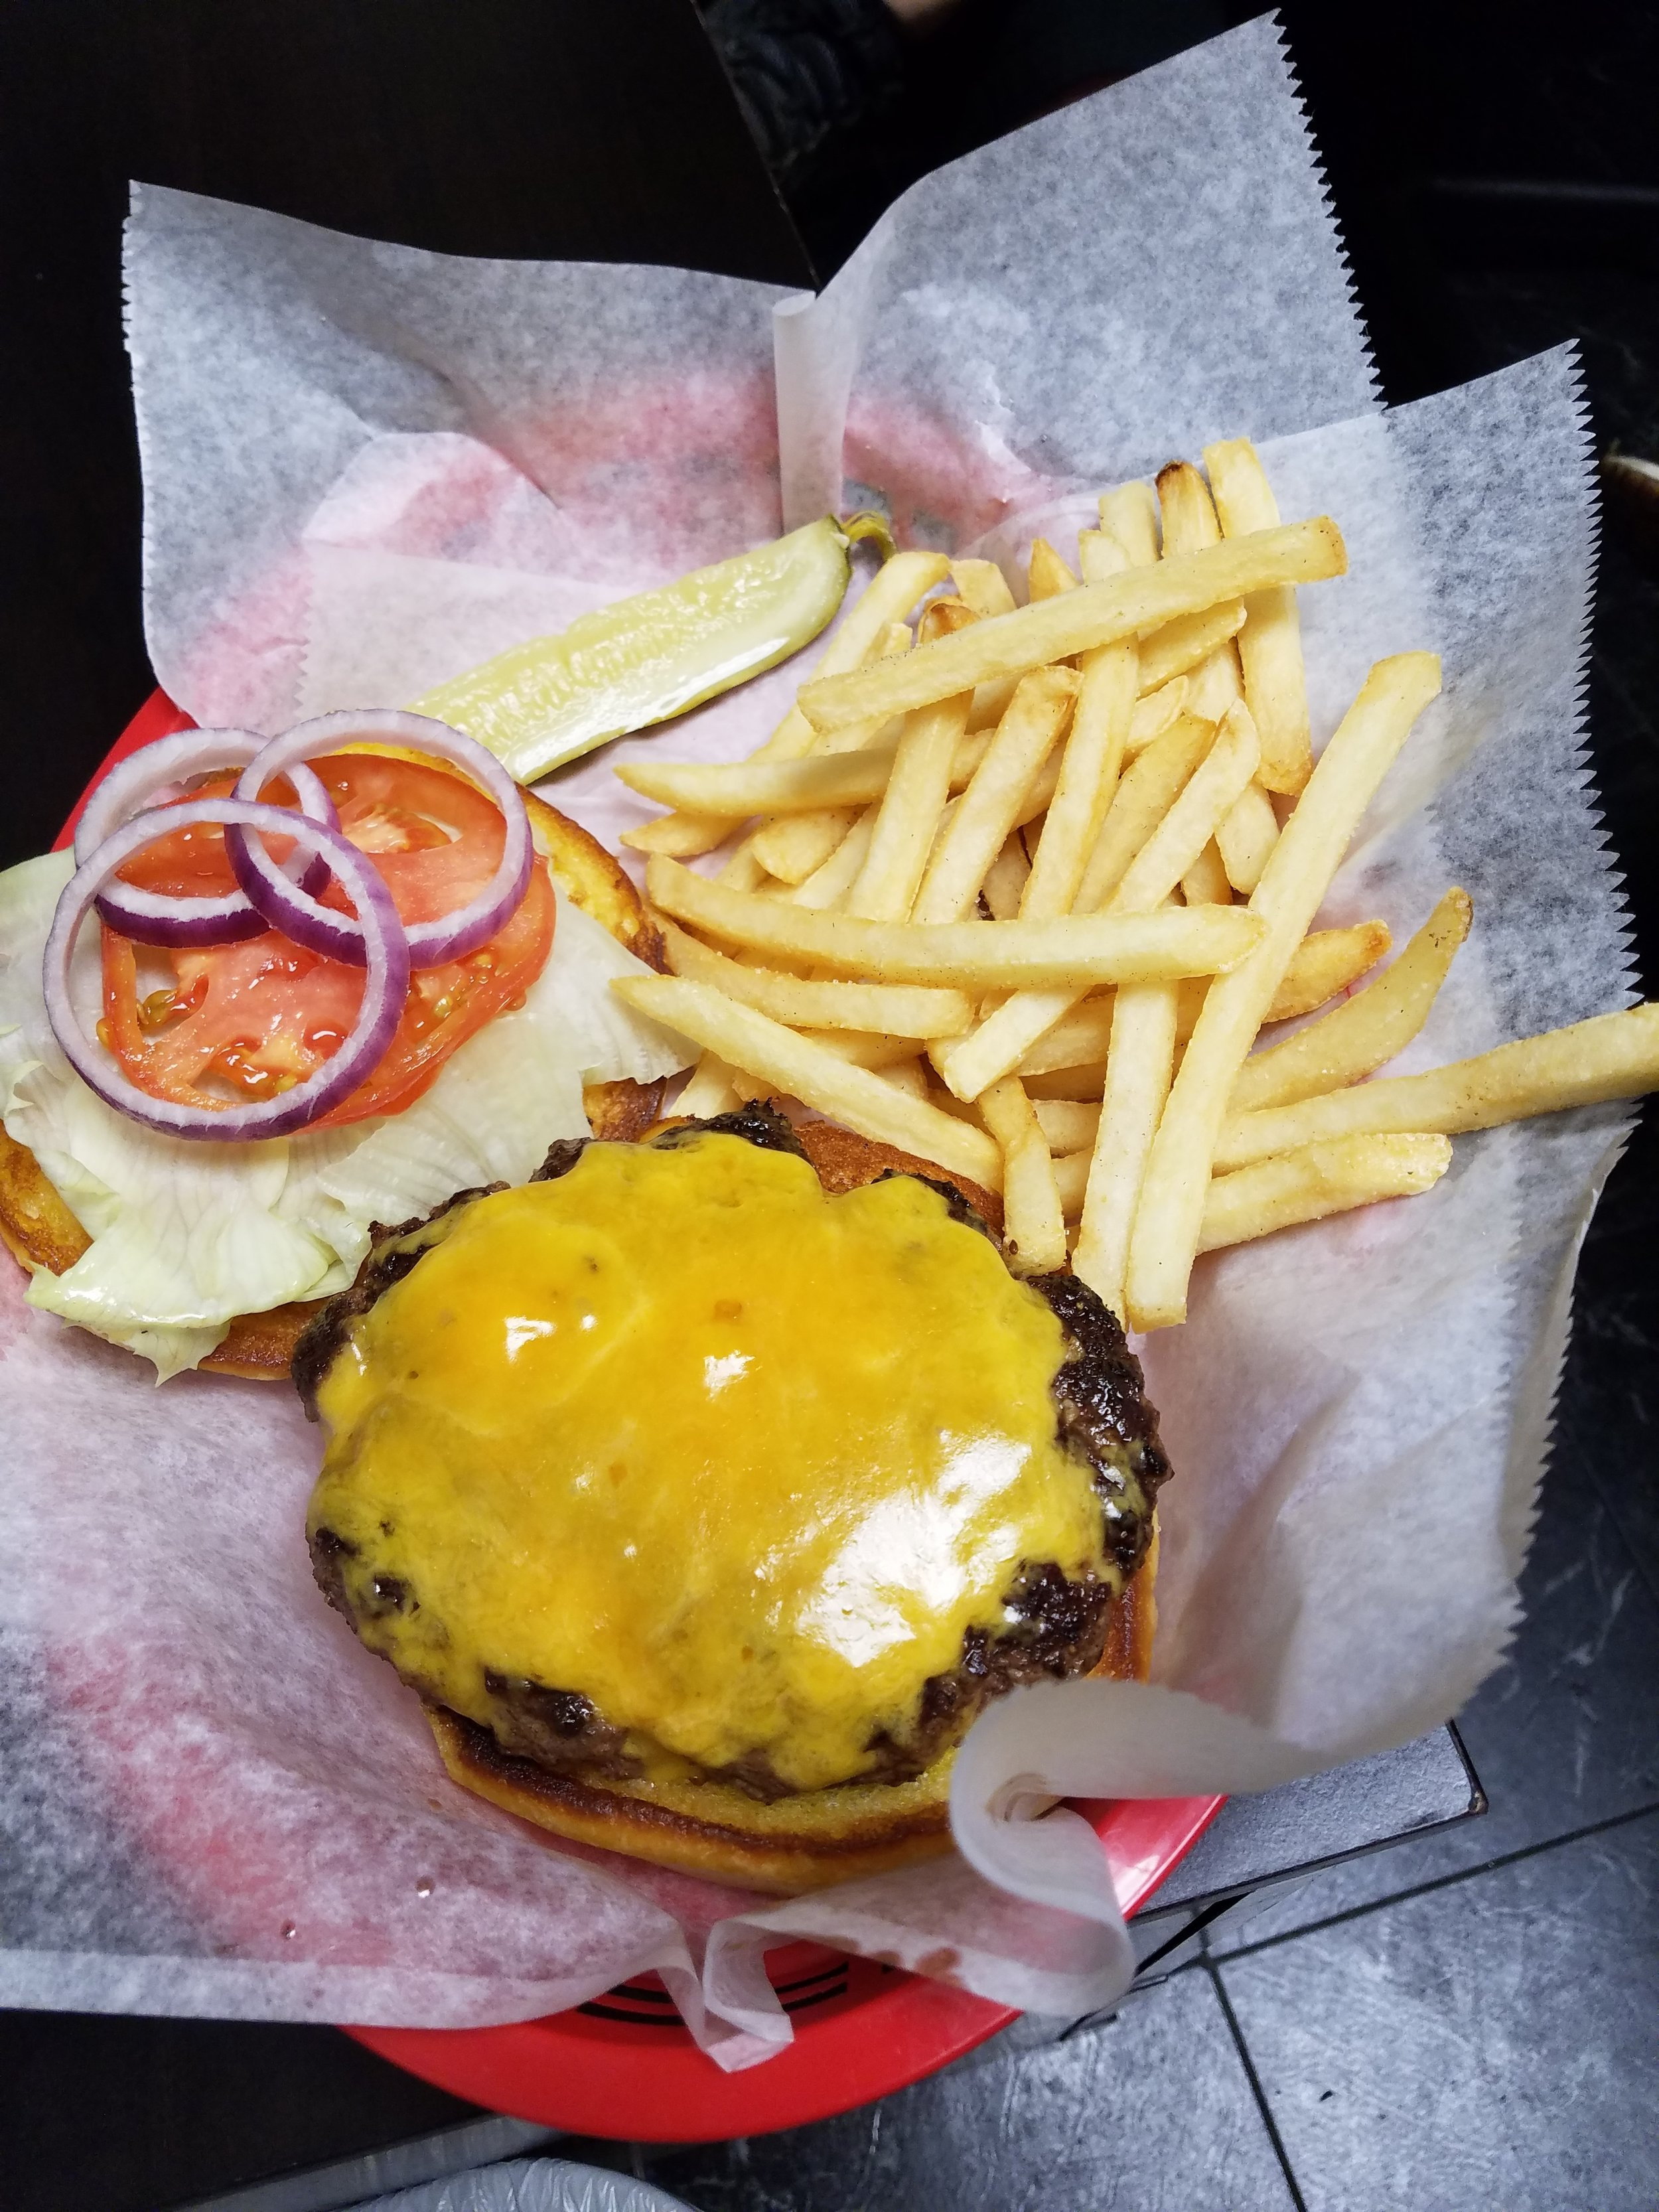 monster burger and fries.jpg